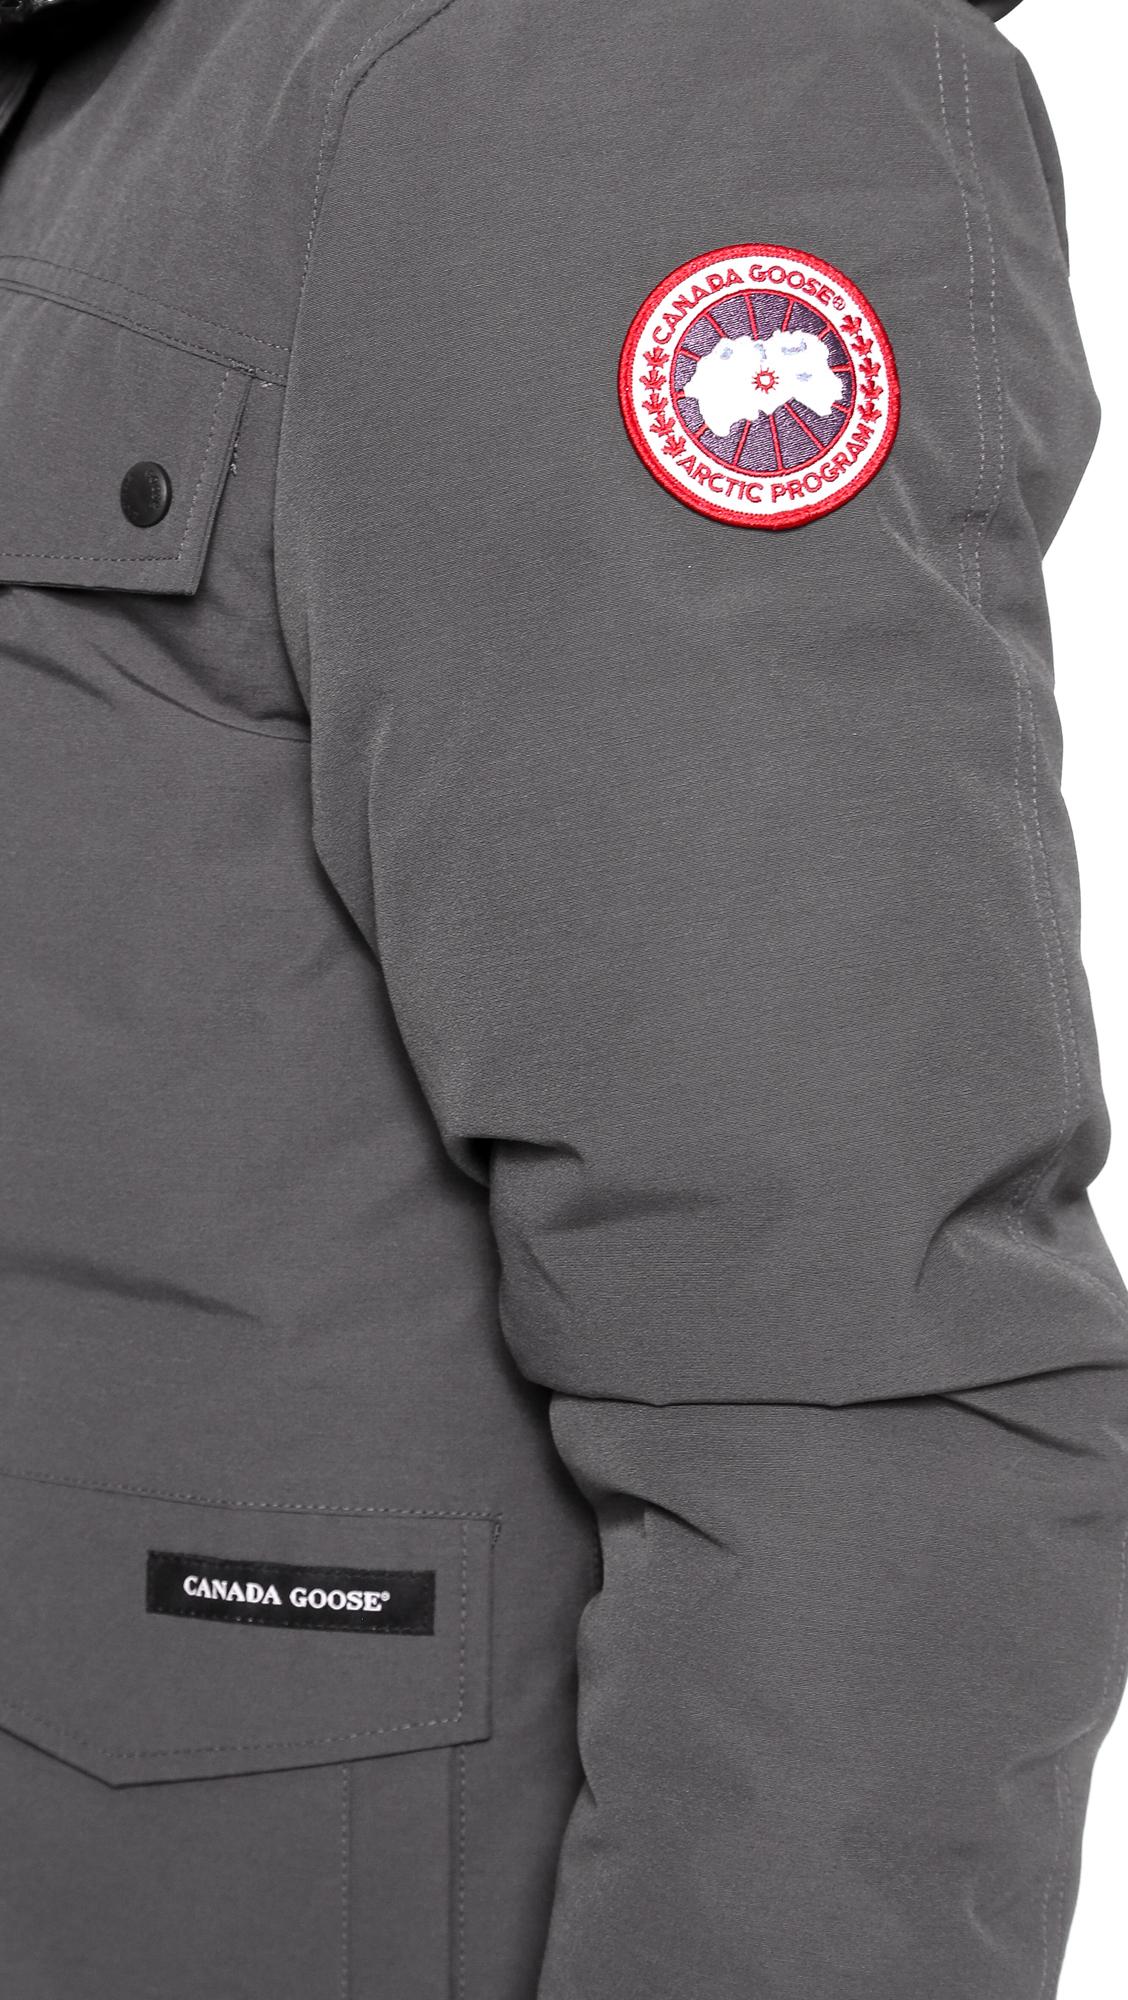 canada goose men's burnett jacket